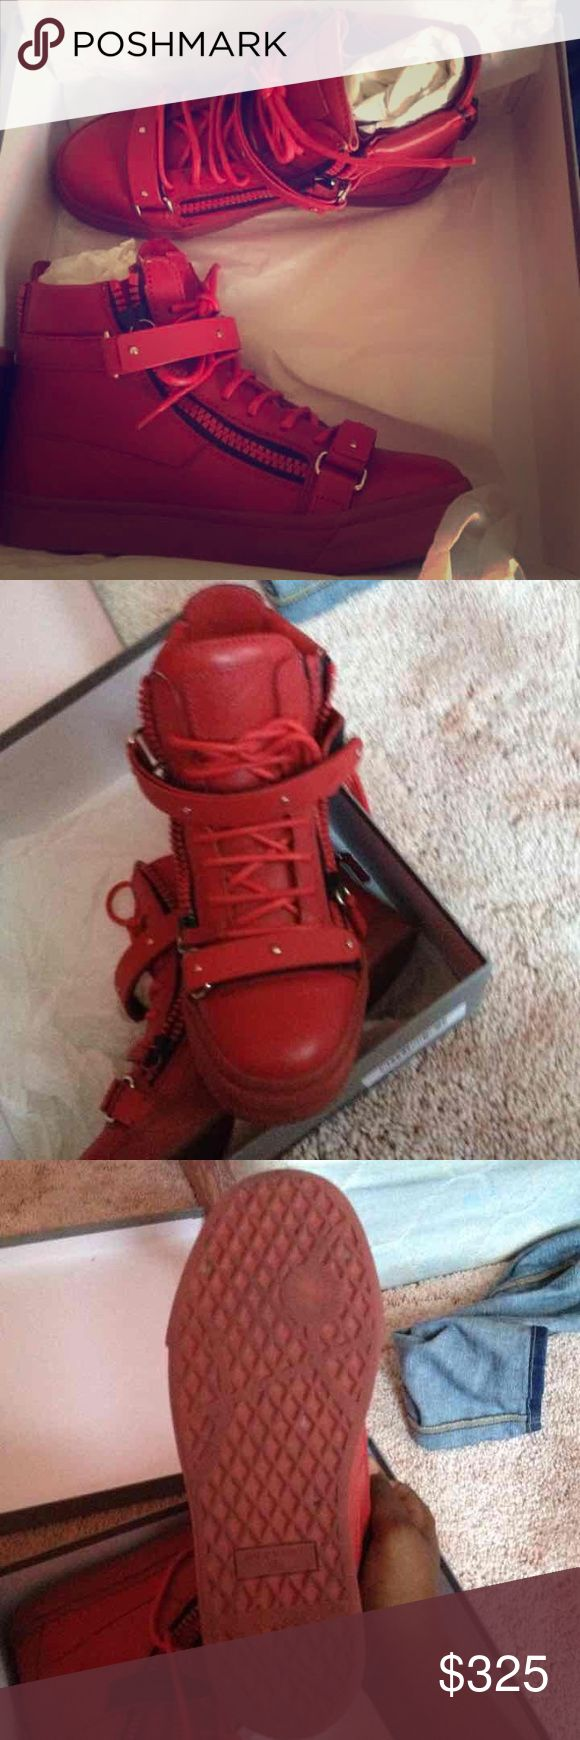 Giuseppe sneakers Size 38.5 Giuseppe Zanotti Shoes Sneakers